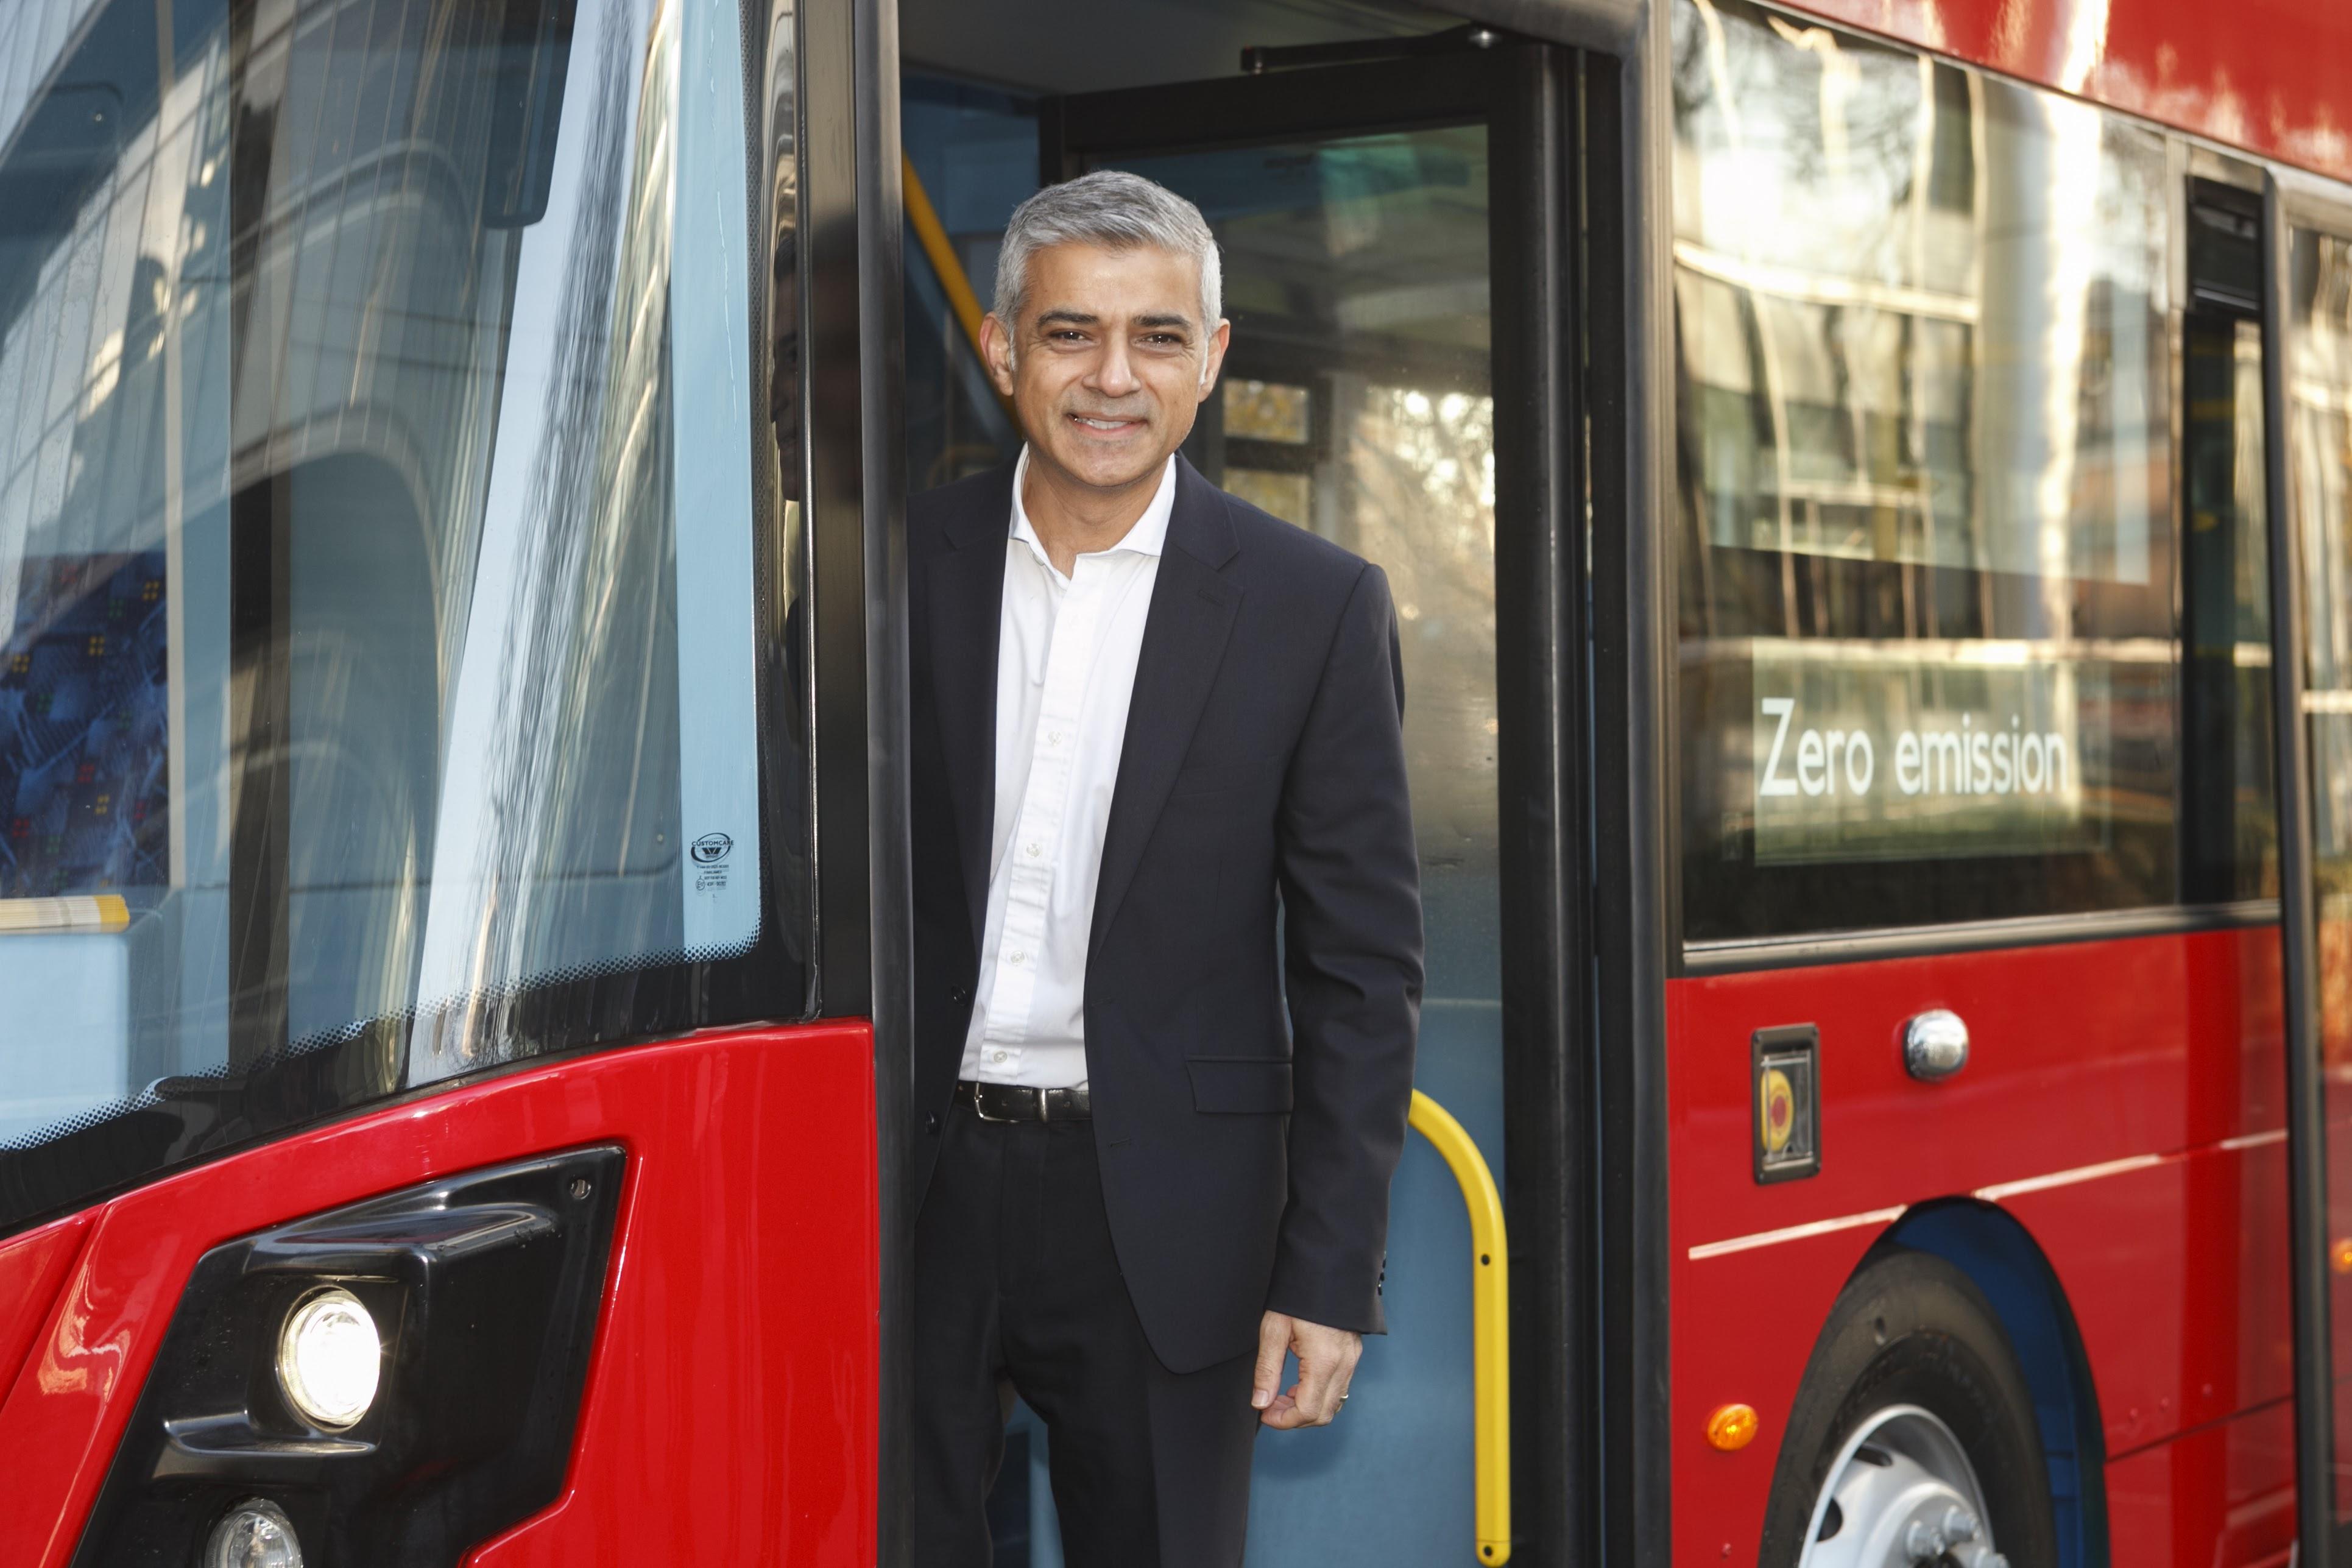 sadiq-khan-hydrogen-zeb-double-decker bus.jpg